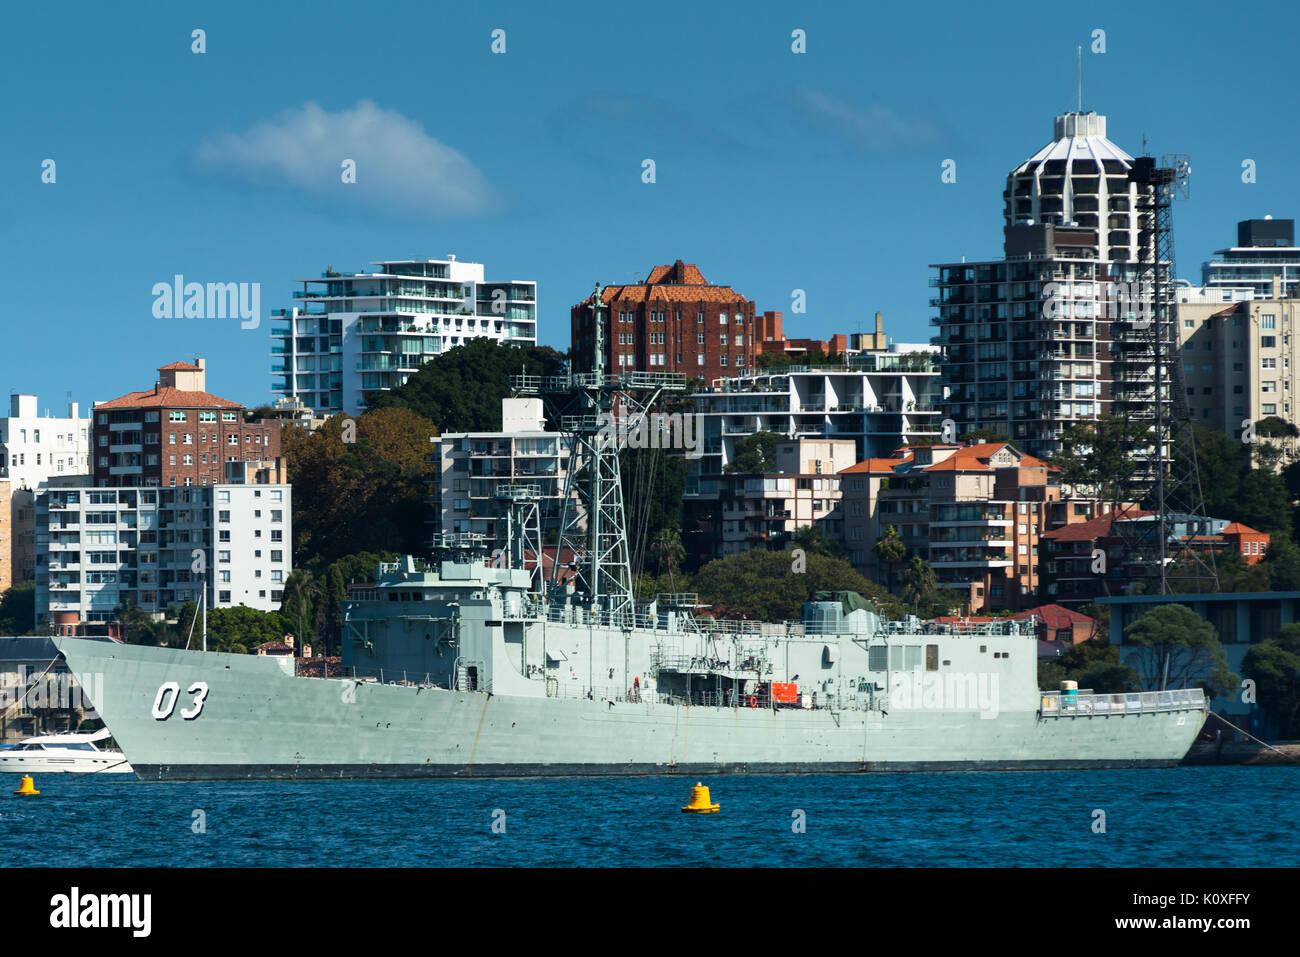 Warship HMAS Sydney at Garden Island Naval base, Potts Point, Sydney, Australia. - Stock Image